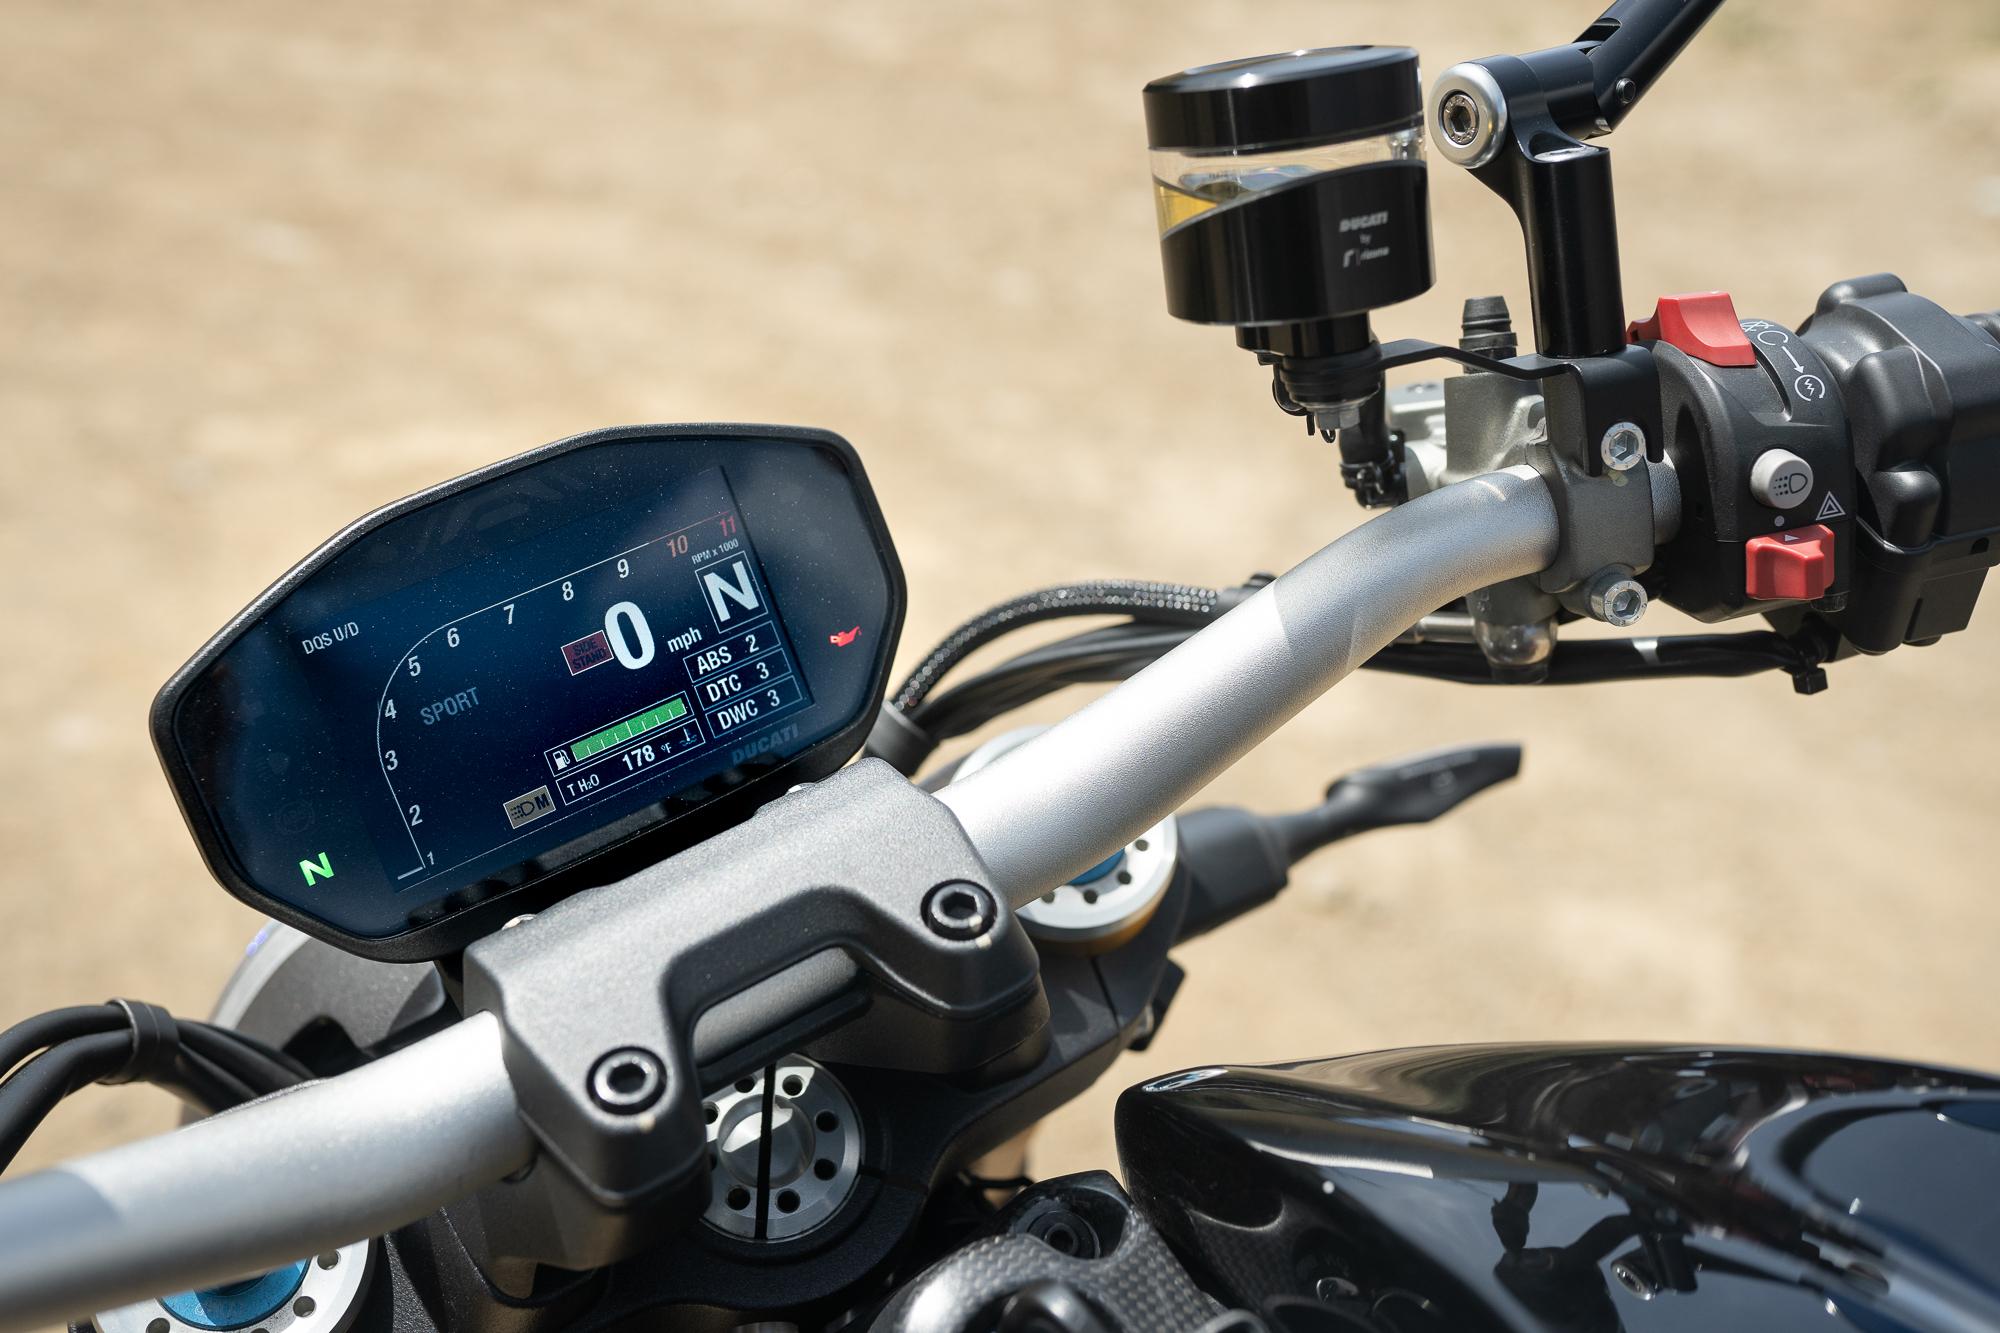 2021 Ducati Monster 1200 S gauges